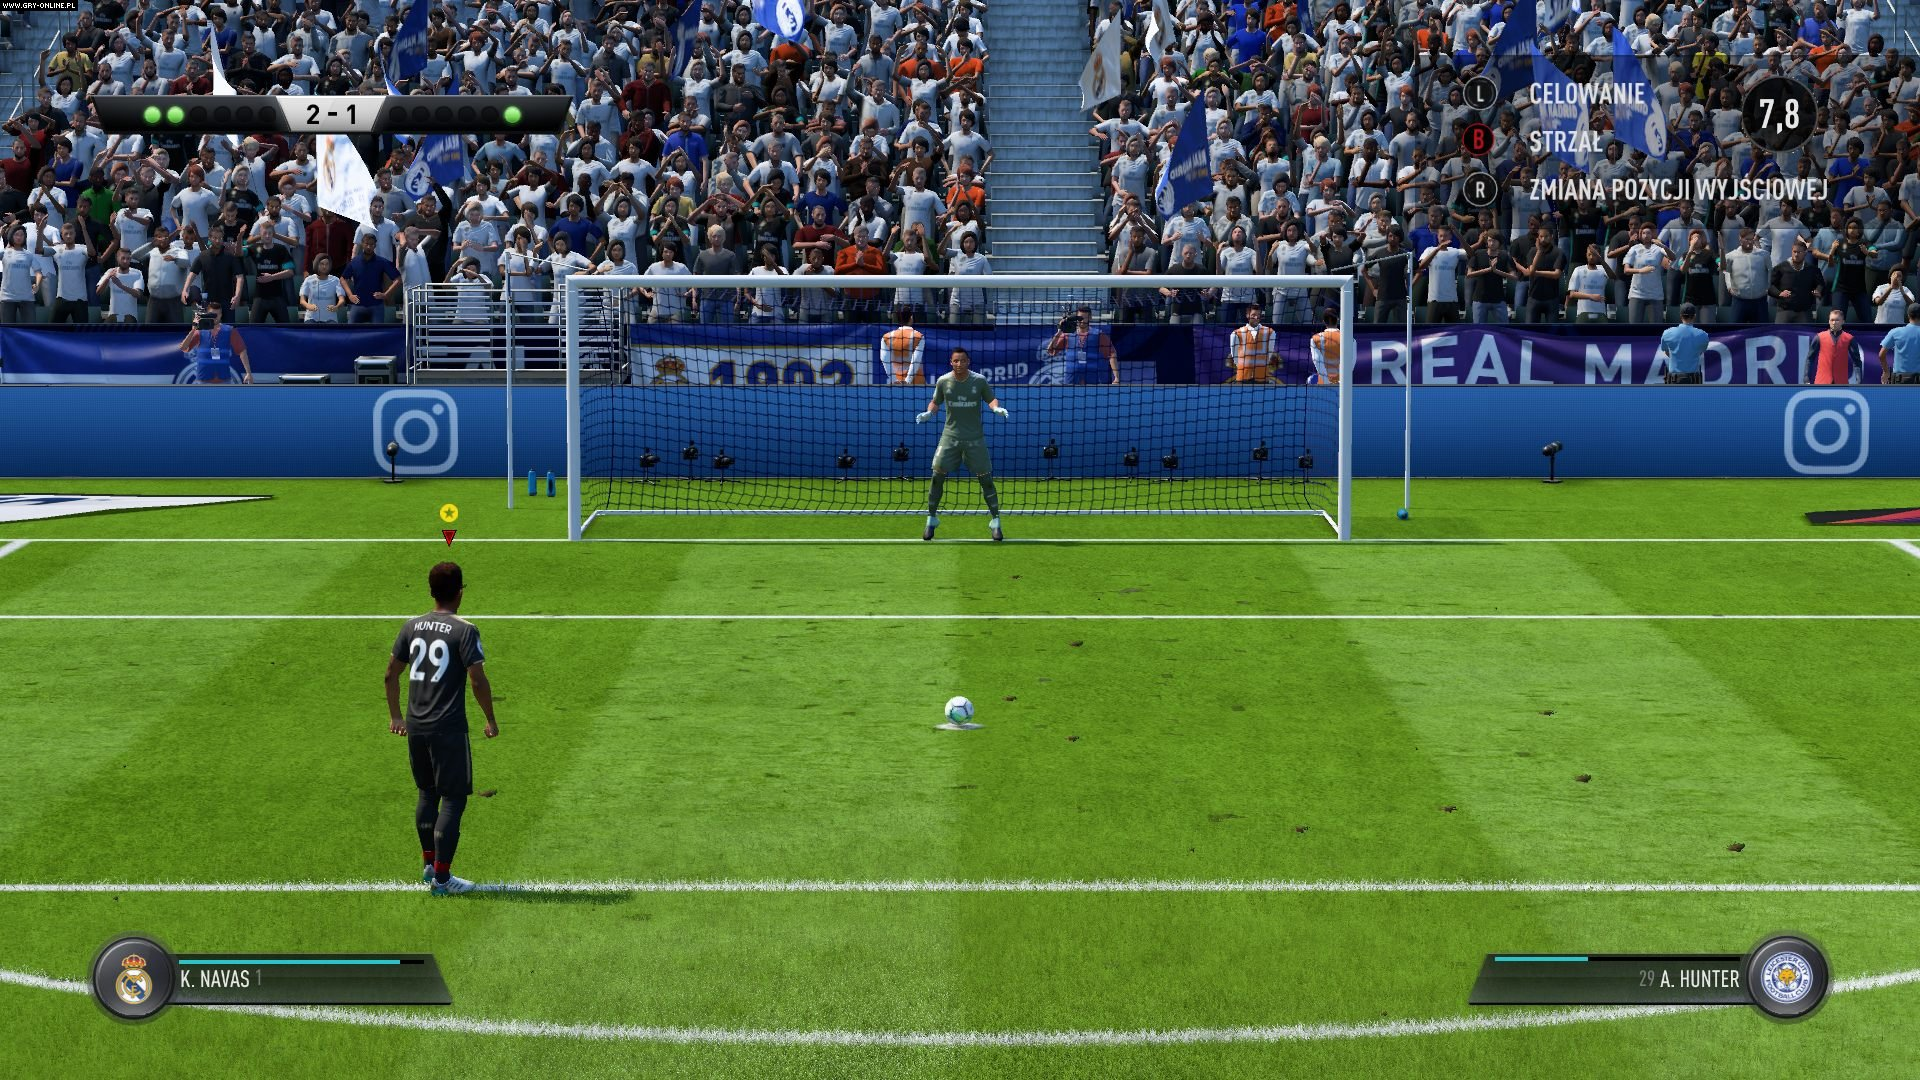 FIFA 18 PC PS4 XONE Games Image 49 EA Sports